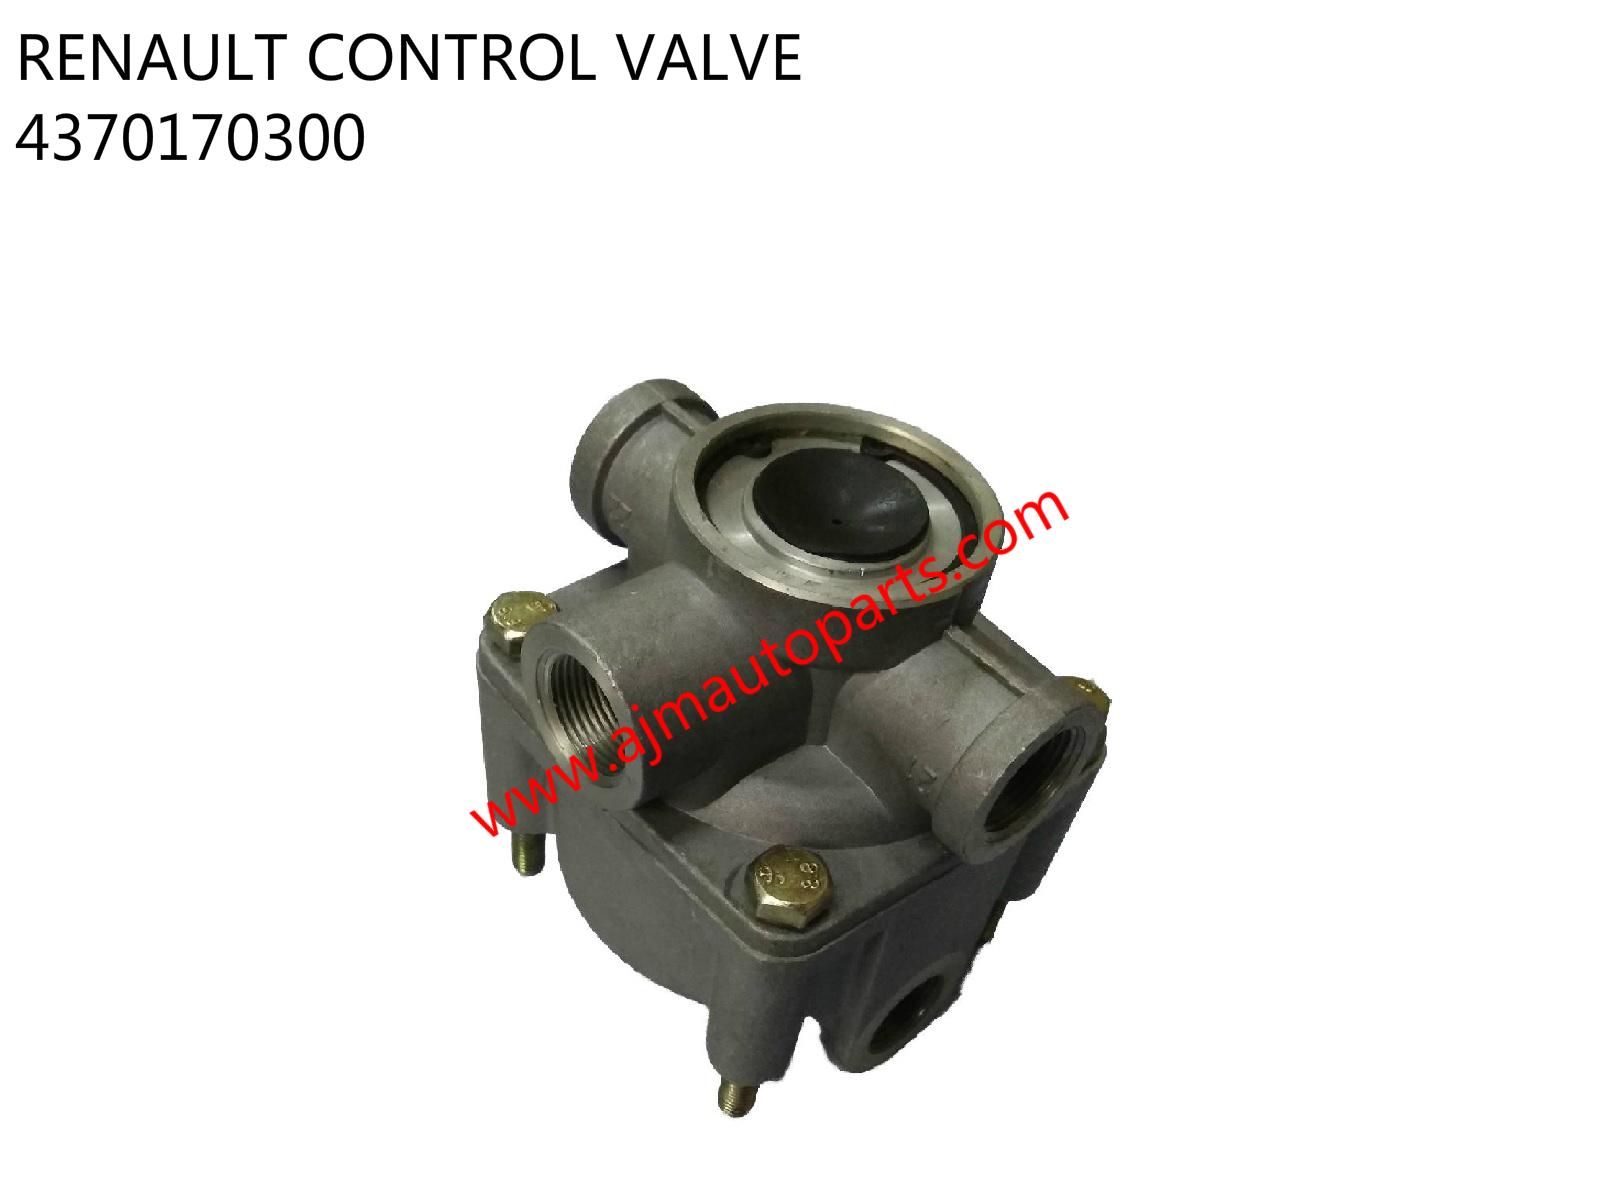 RENAULT CONTROL VALVE-4370170300